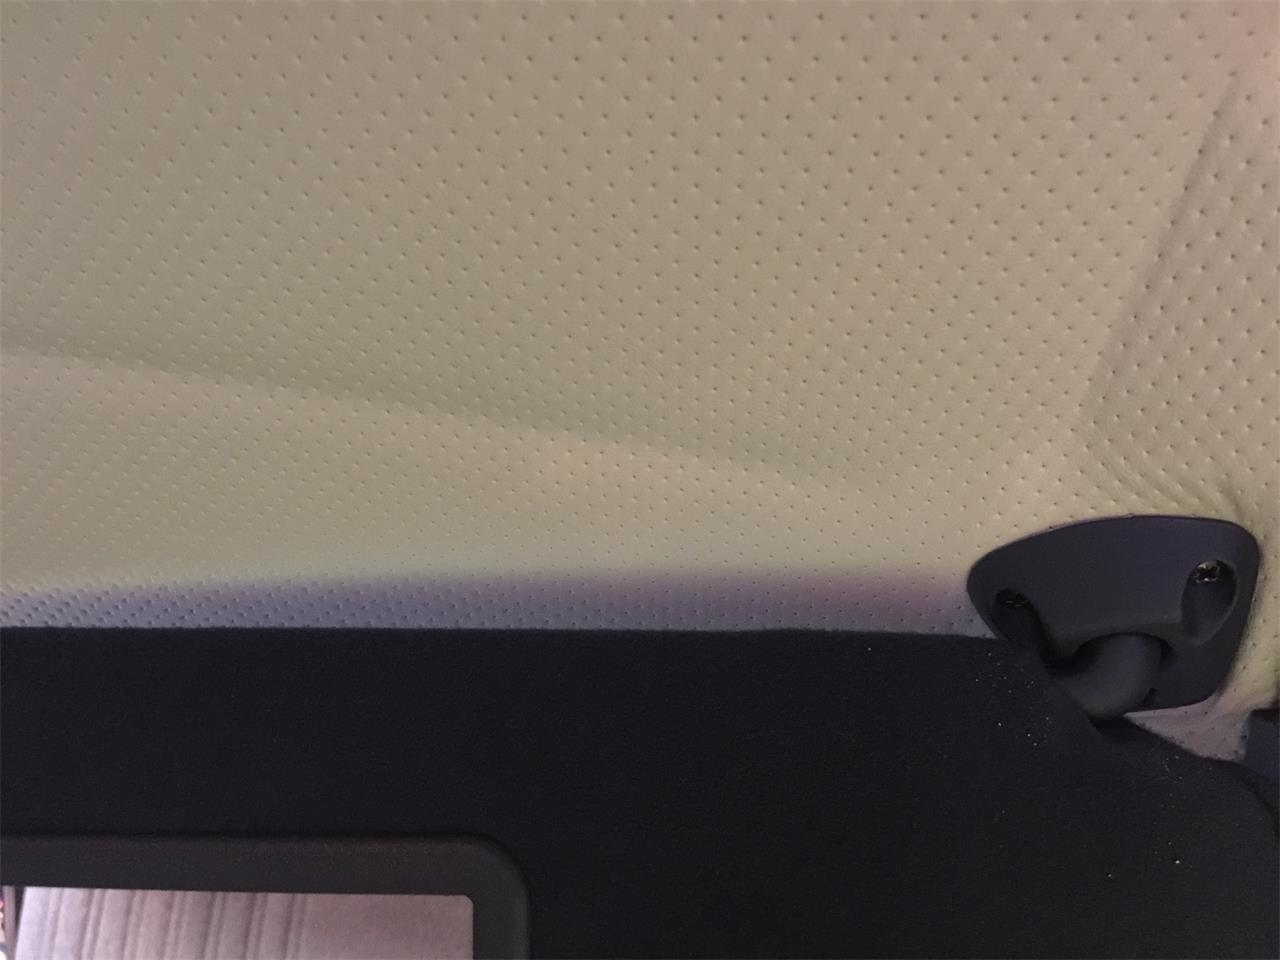 Large Picture of '93 Chevrolet C/K 1500 - $9,000.00 - K0FJ